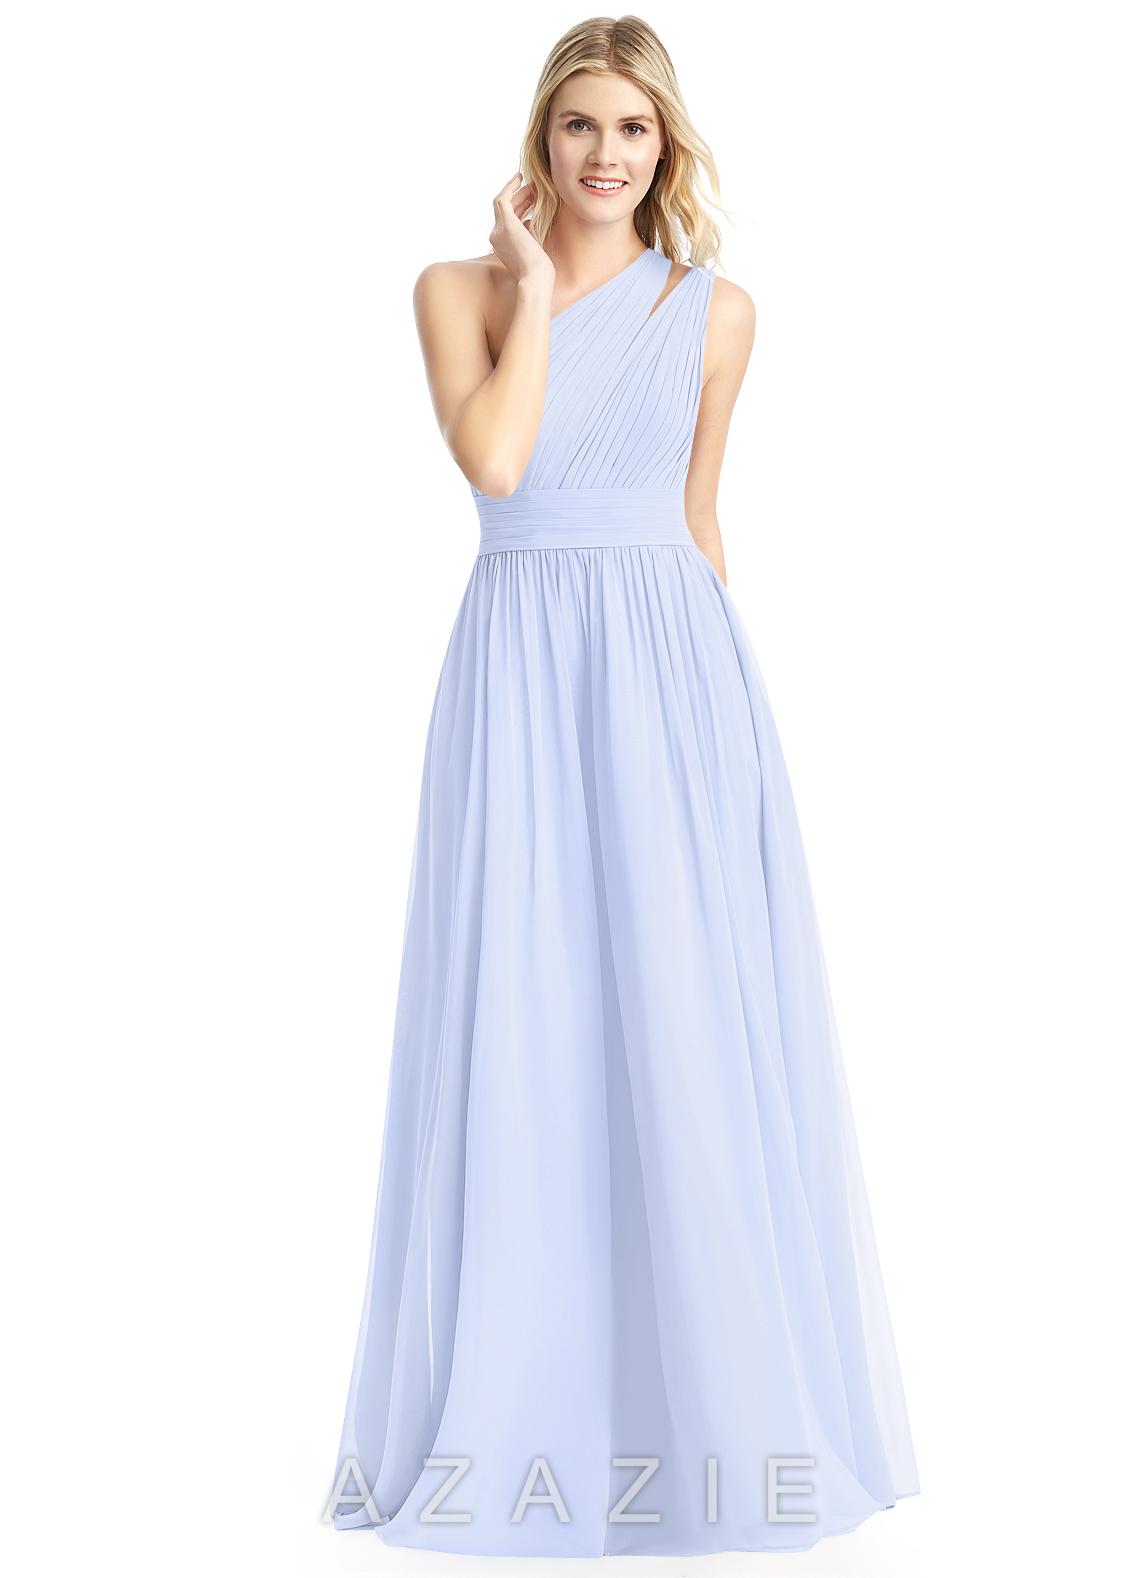 Azazie molly bridesmaid dress azazie loading zoom ombrellifo Images